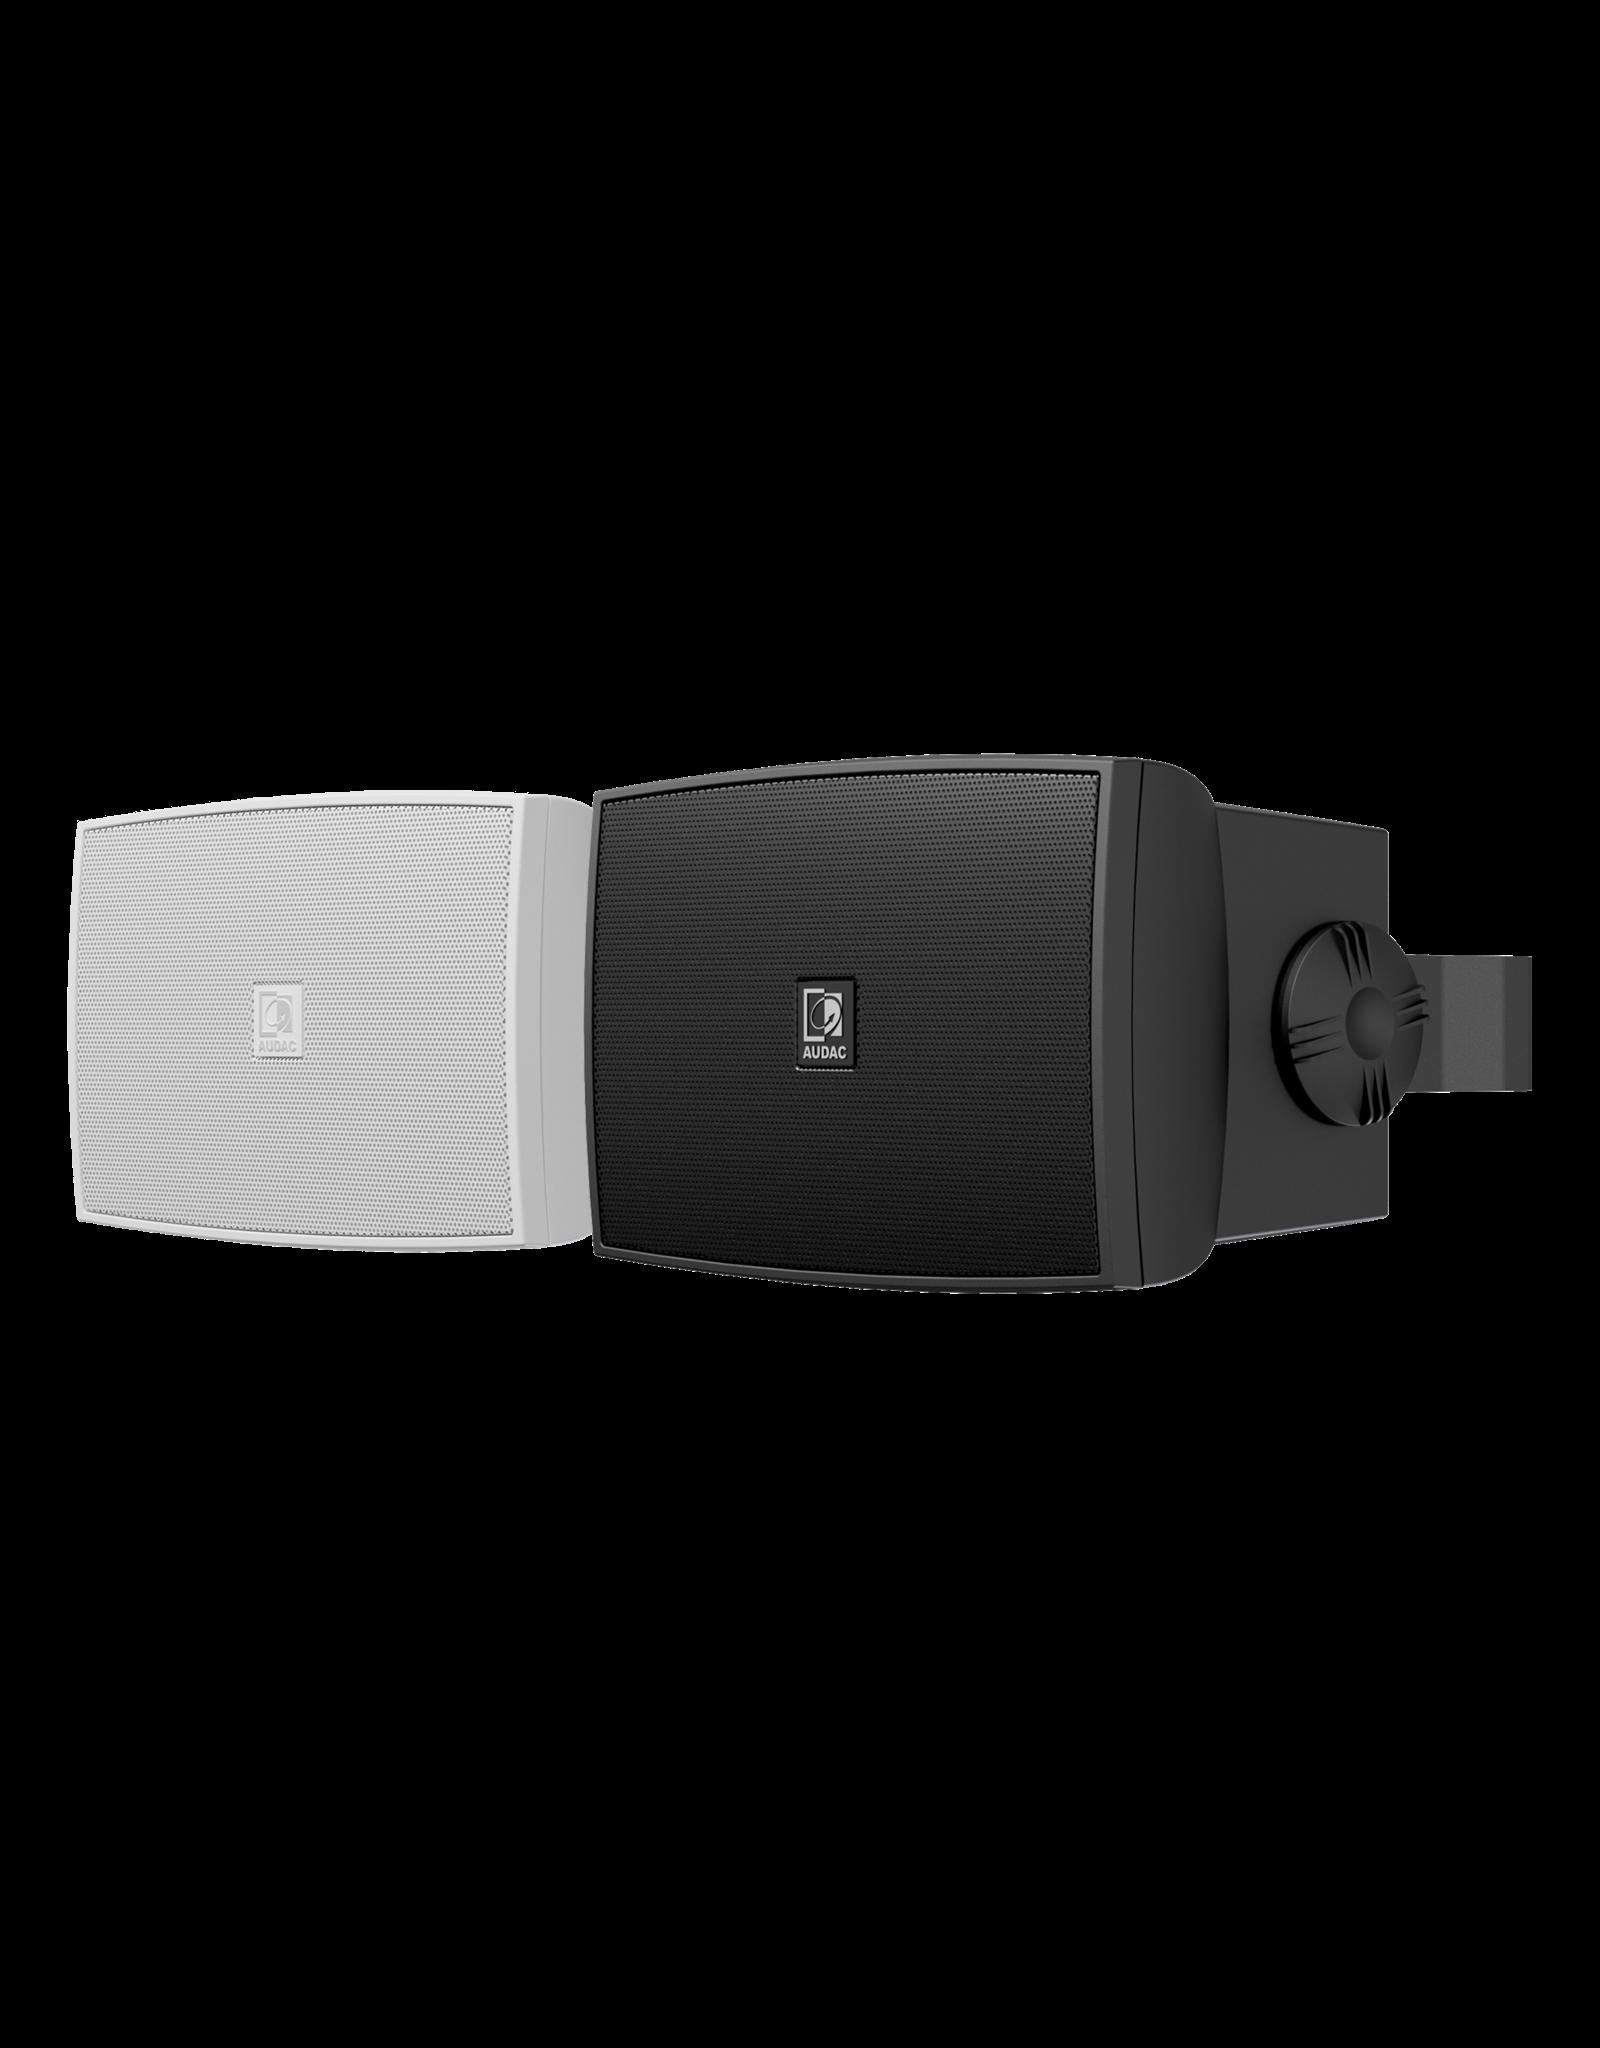 "Audac Outdoor universal wall speaker 3"" Outdoor white version"